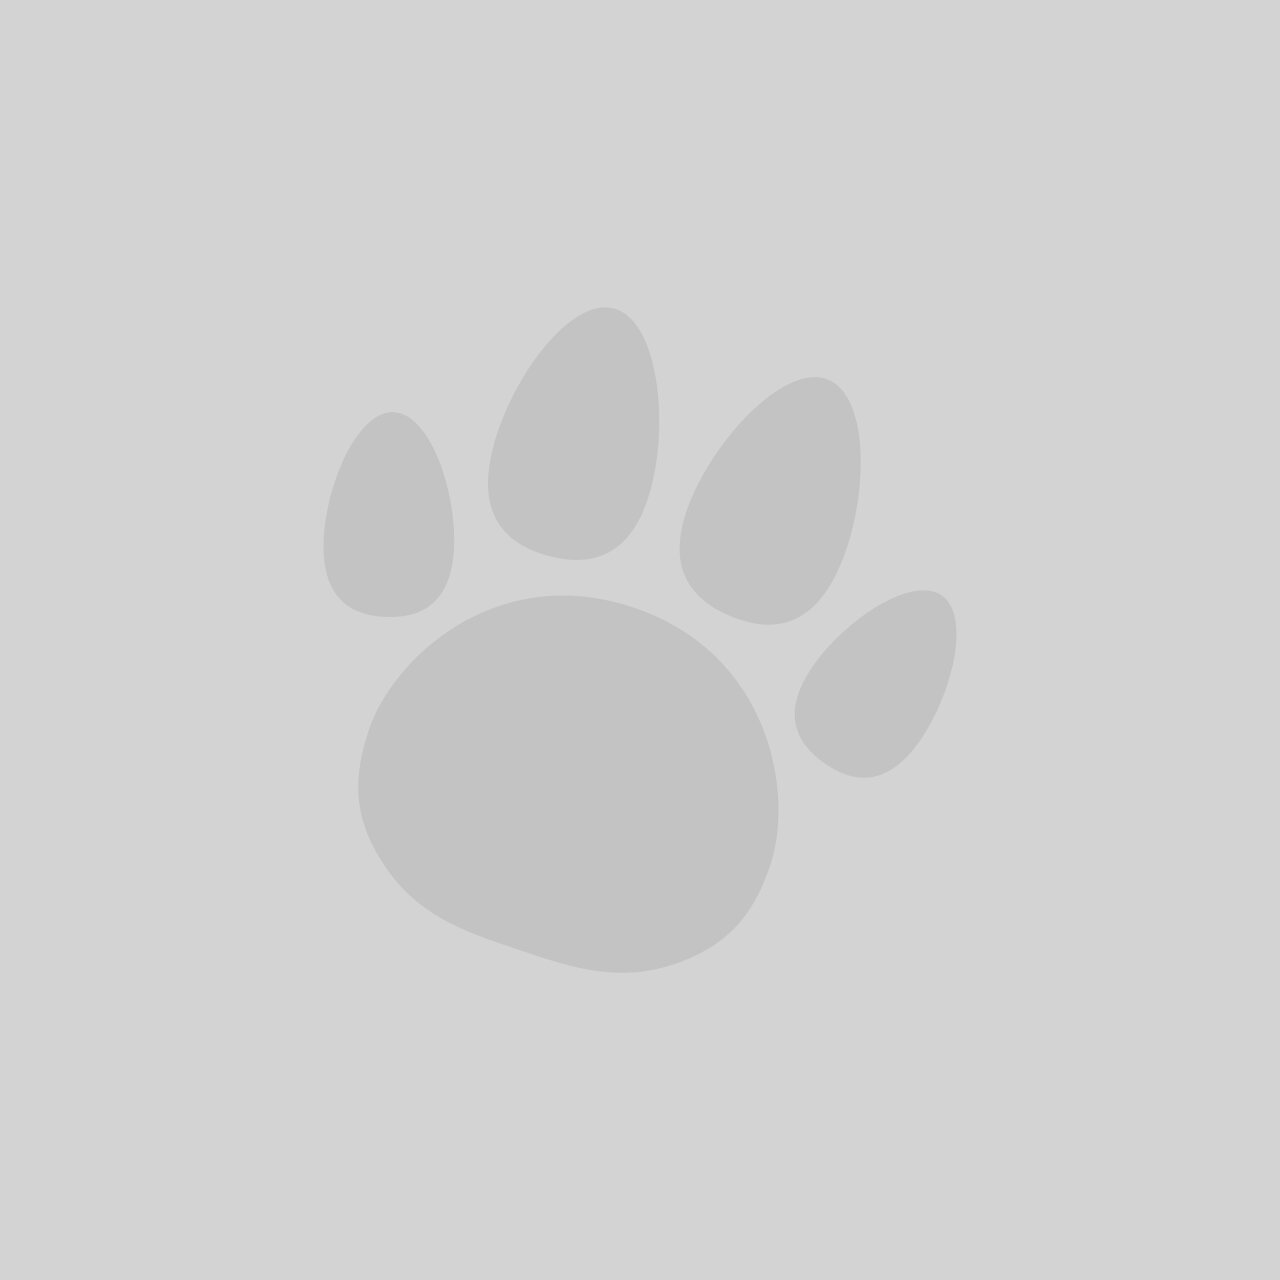 Iams Dog Food Adult Small/Medium Chicken 2kg